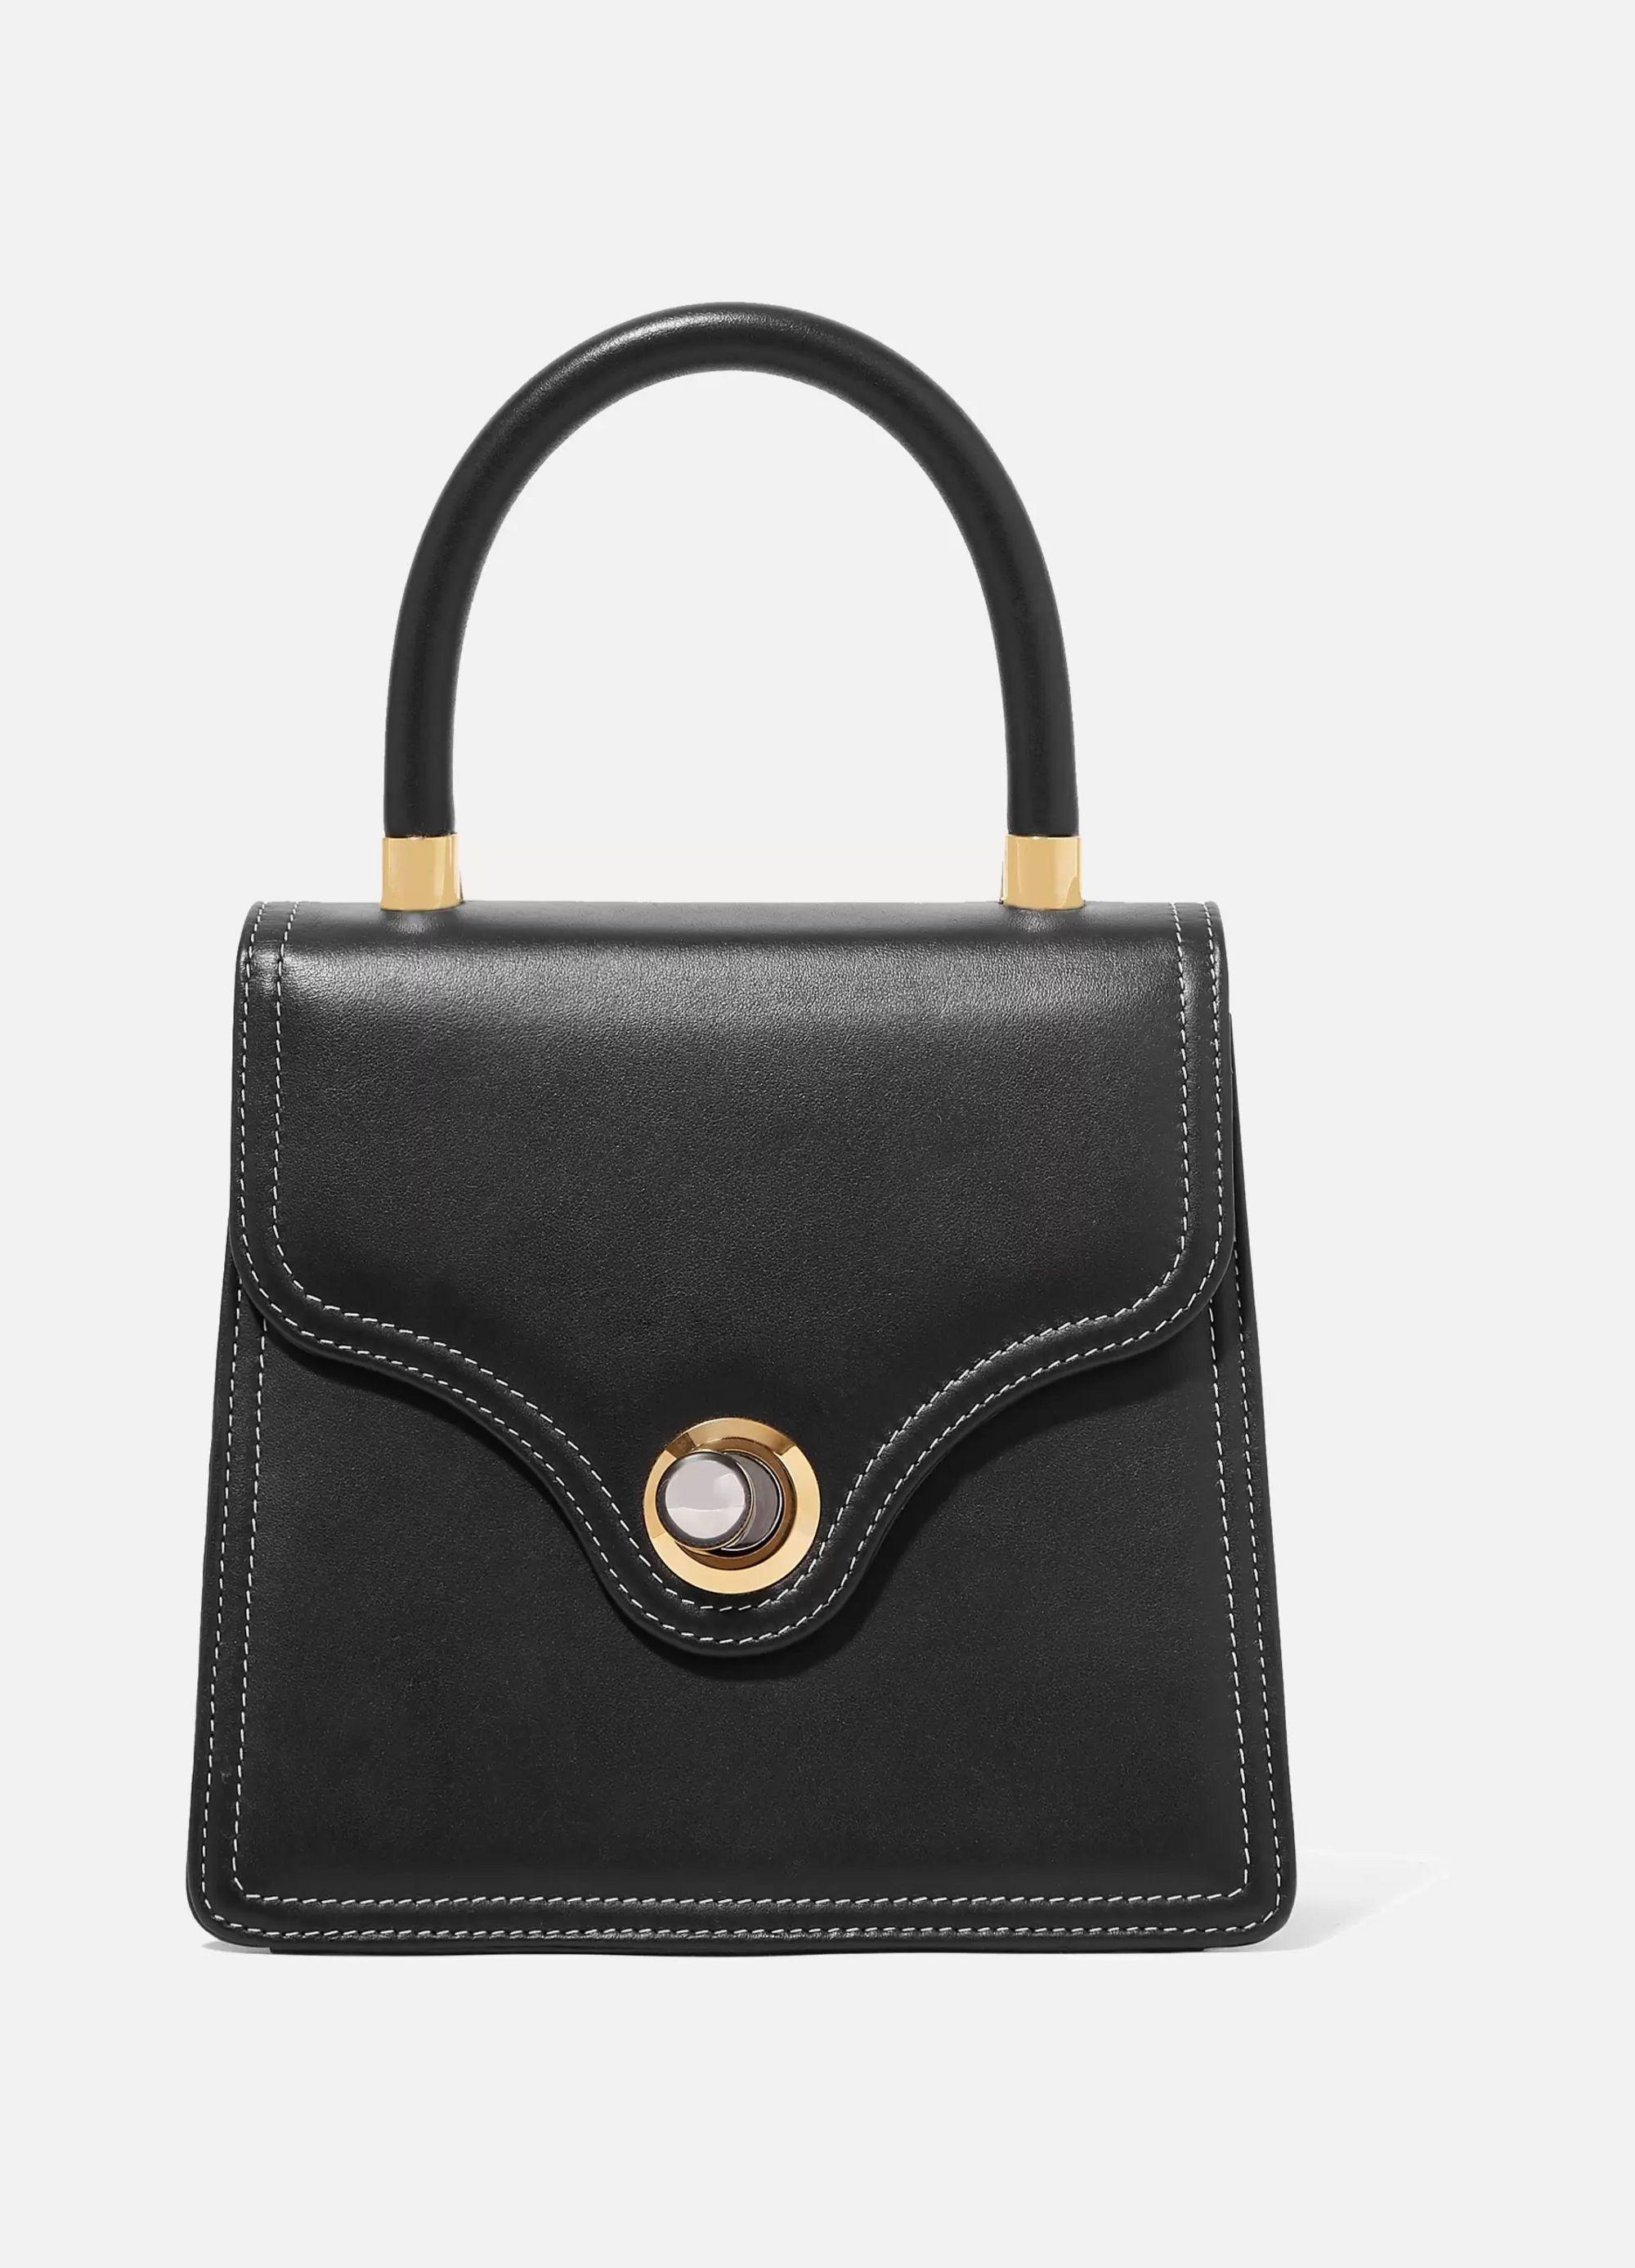 Ratio et Motus Lady leather tote